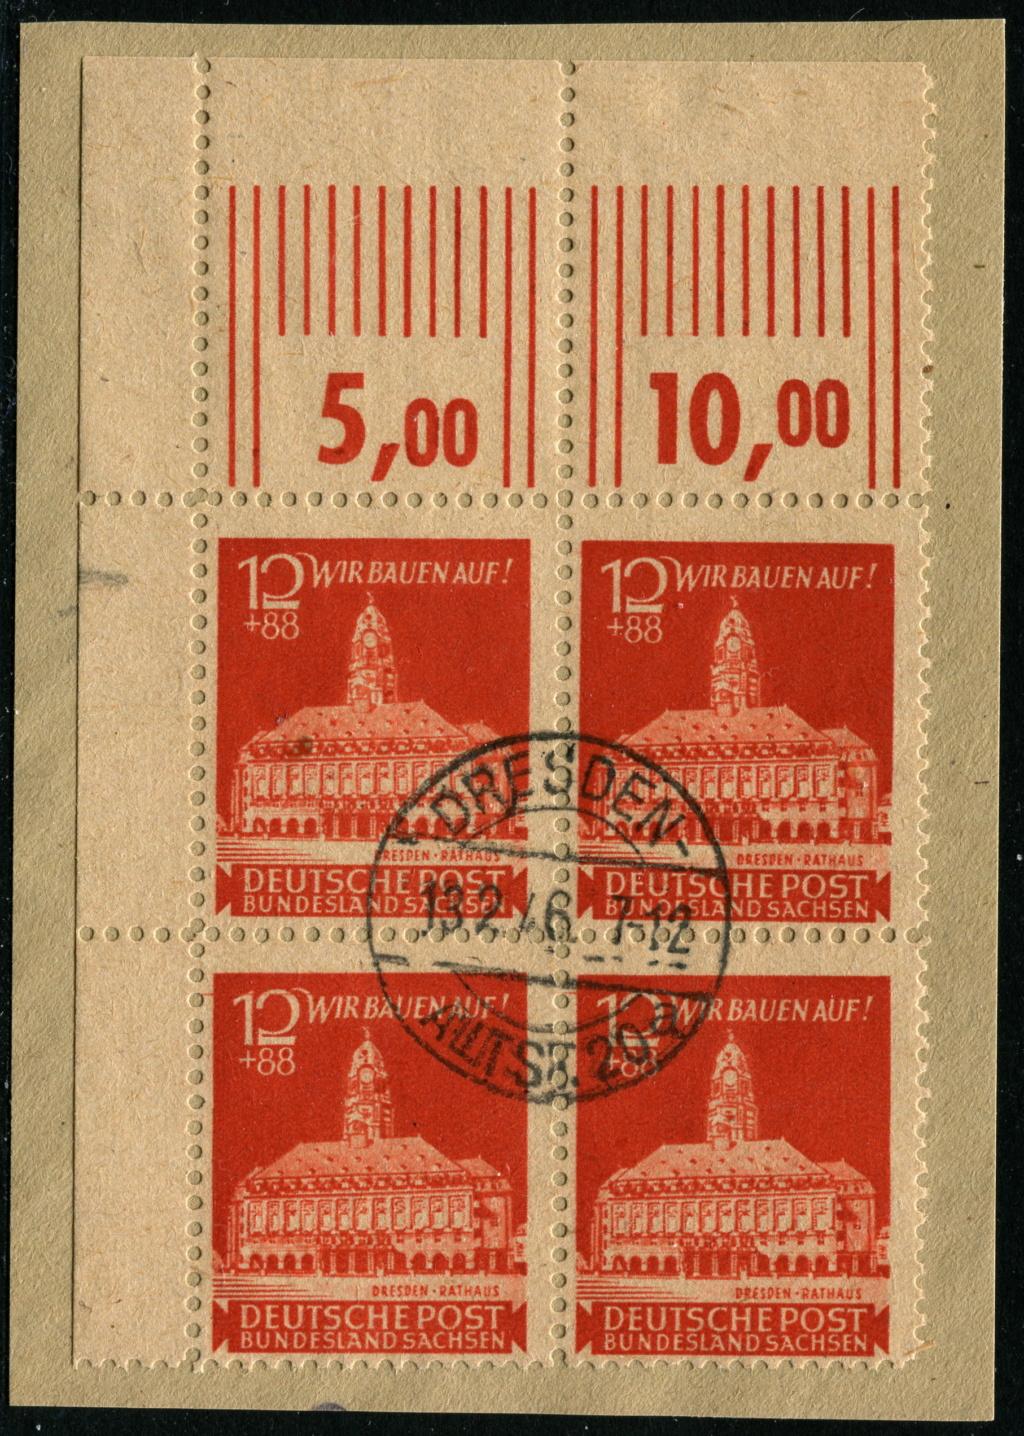 Ostsachsen (OPD Dresden) -Sowjetische Besatzungszone- - Seite 15 65_a_e10